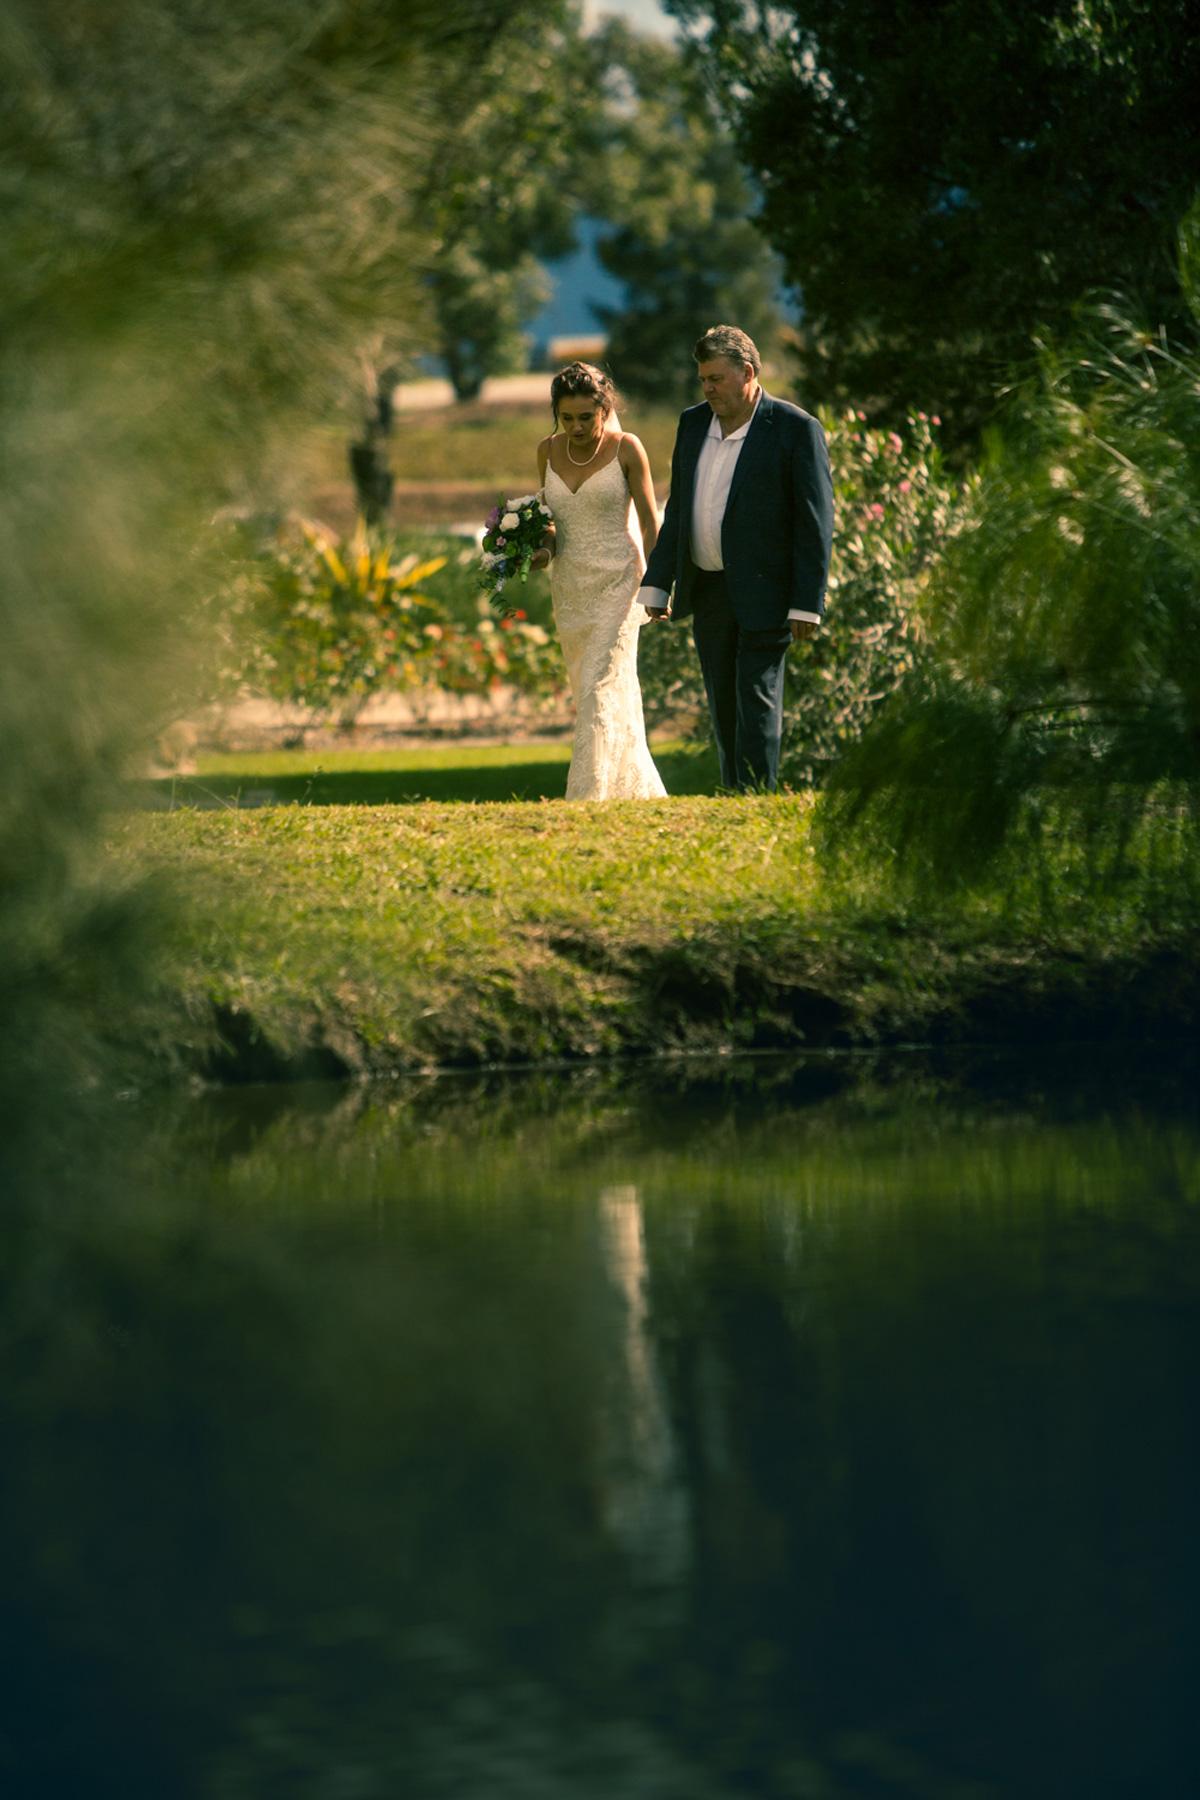 010-Sean-&-Kayleigh-Wedding